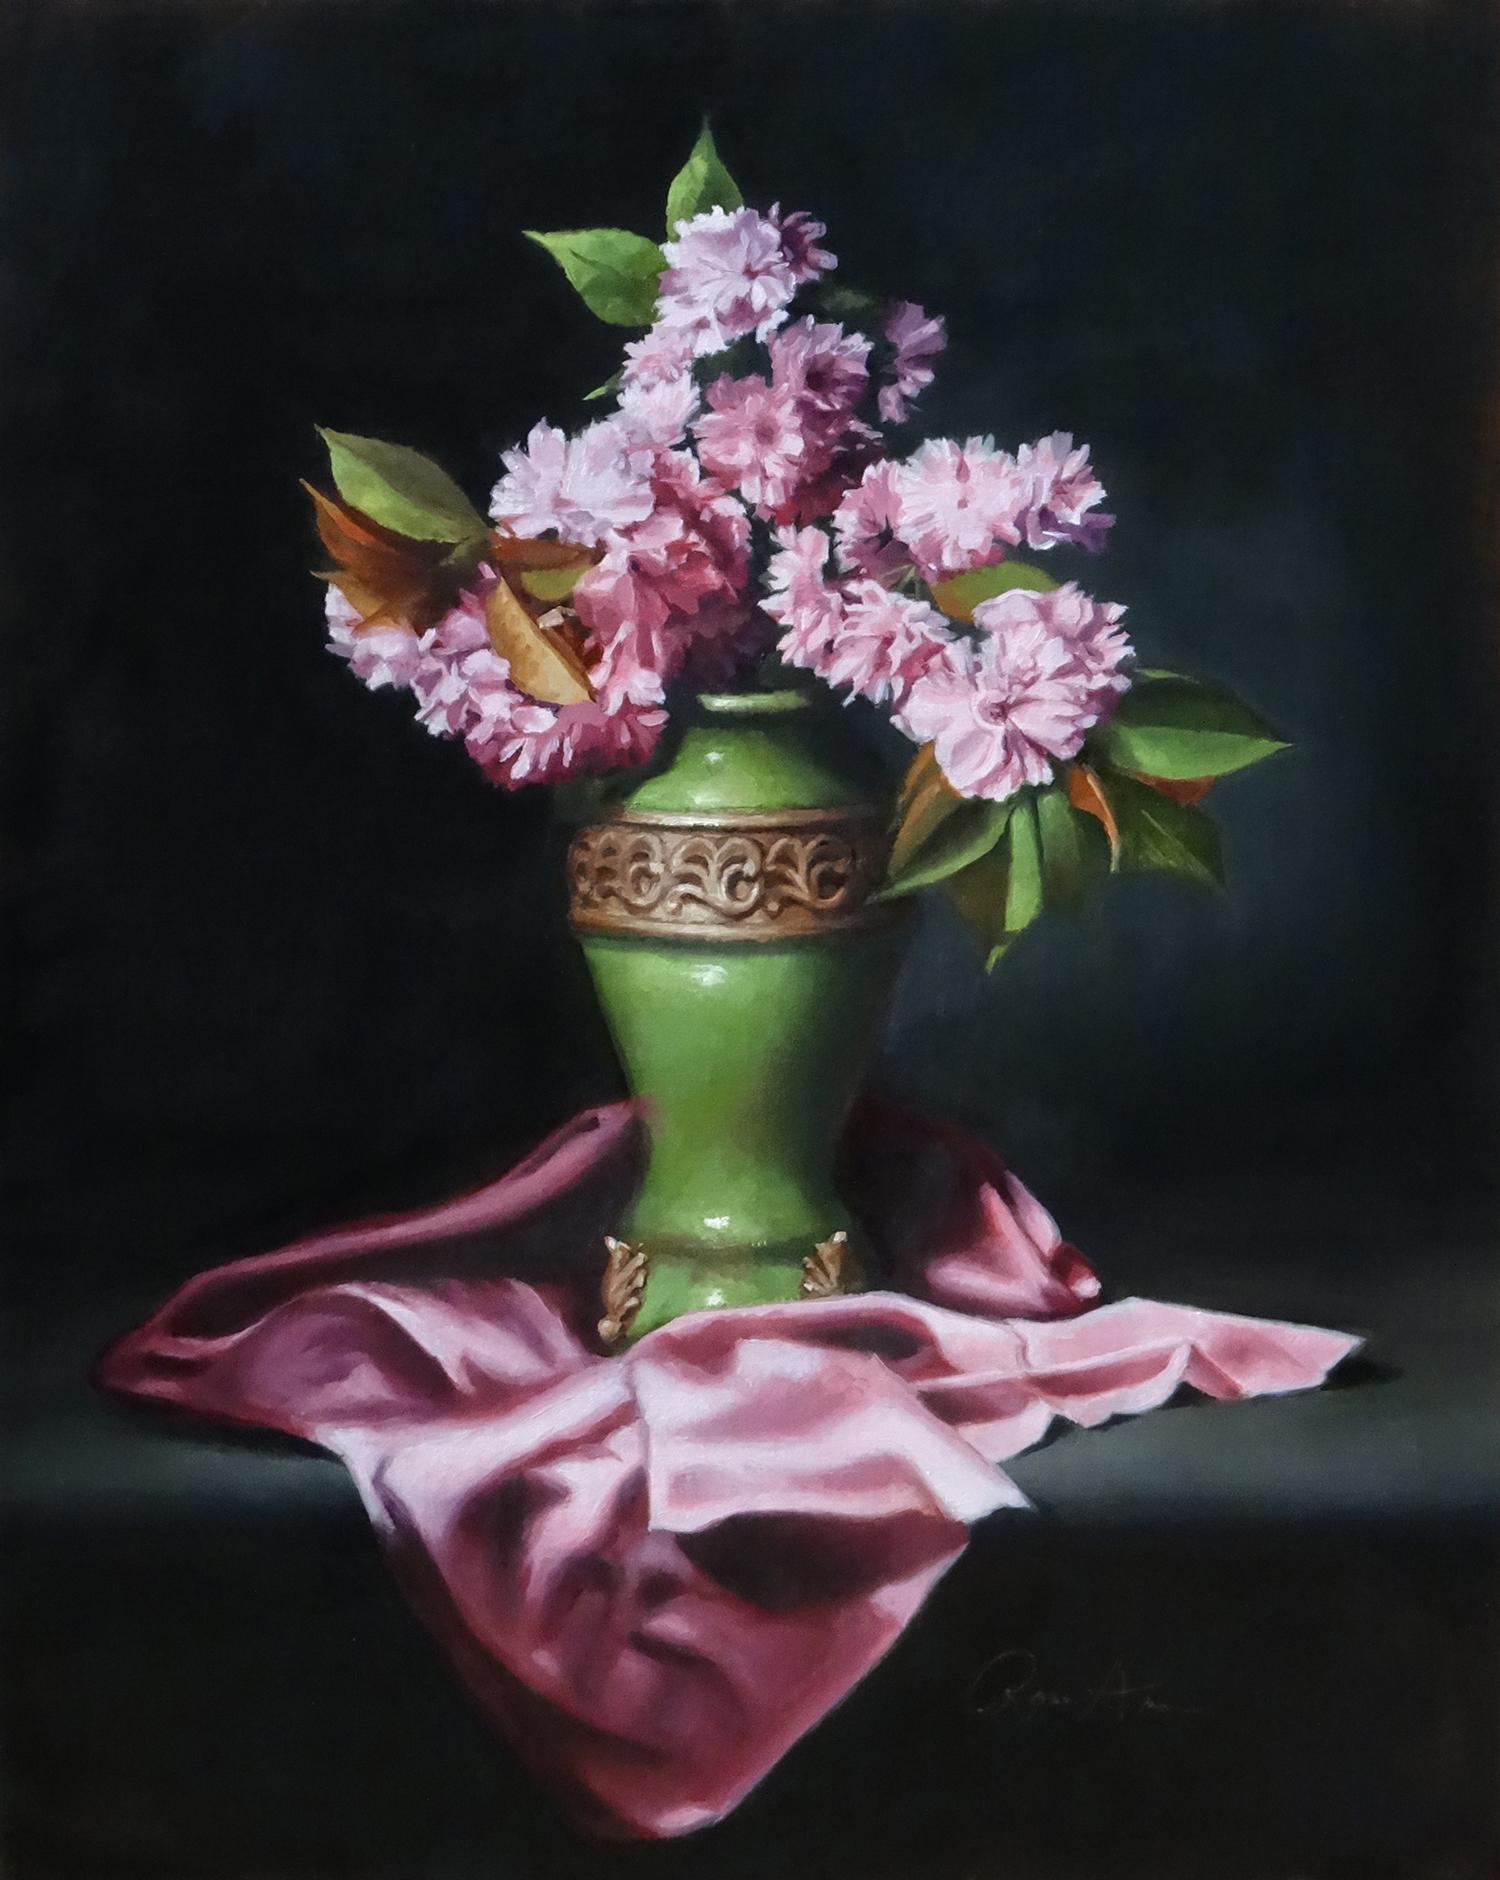 Rose Ann Bernatovich Title: Cherry Blossoms Size: 20 x 16 x .25 Price: $1200